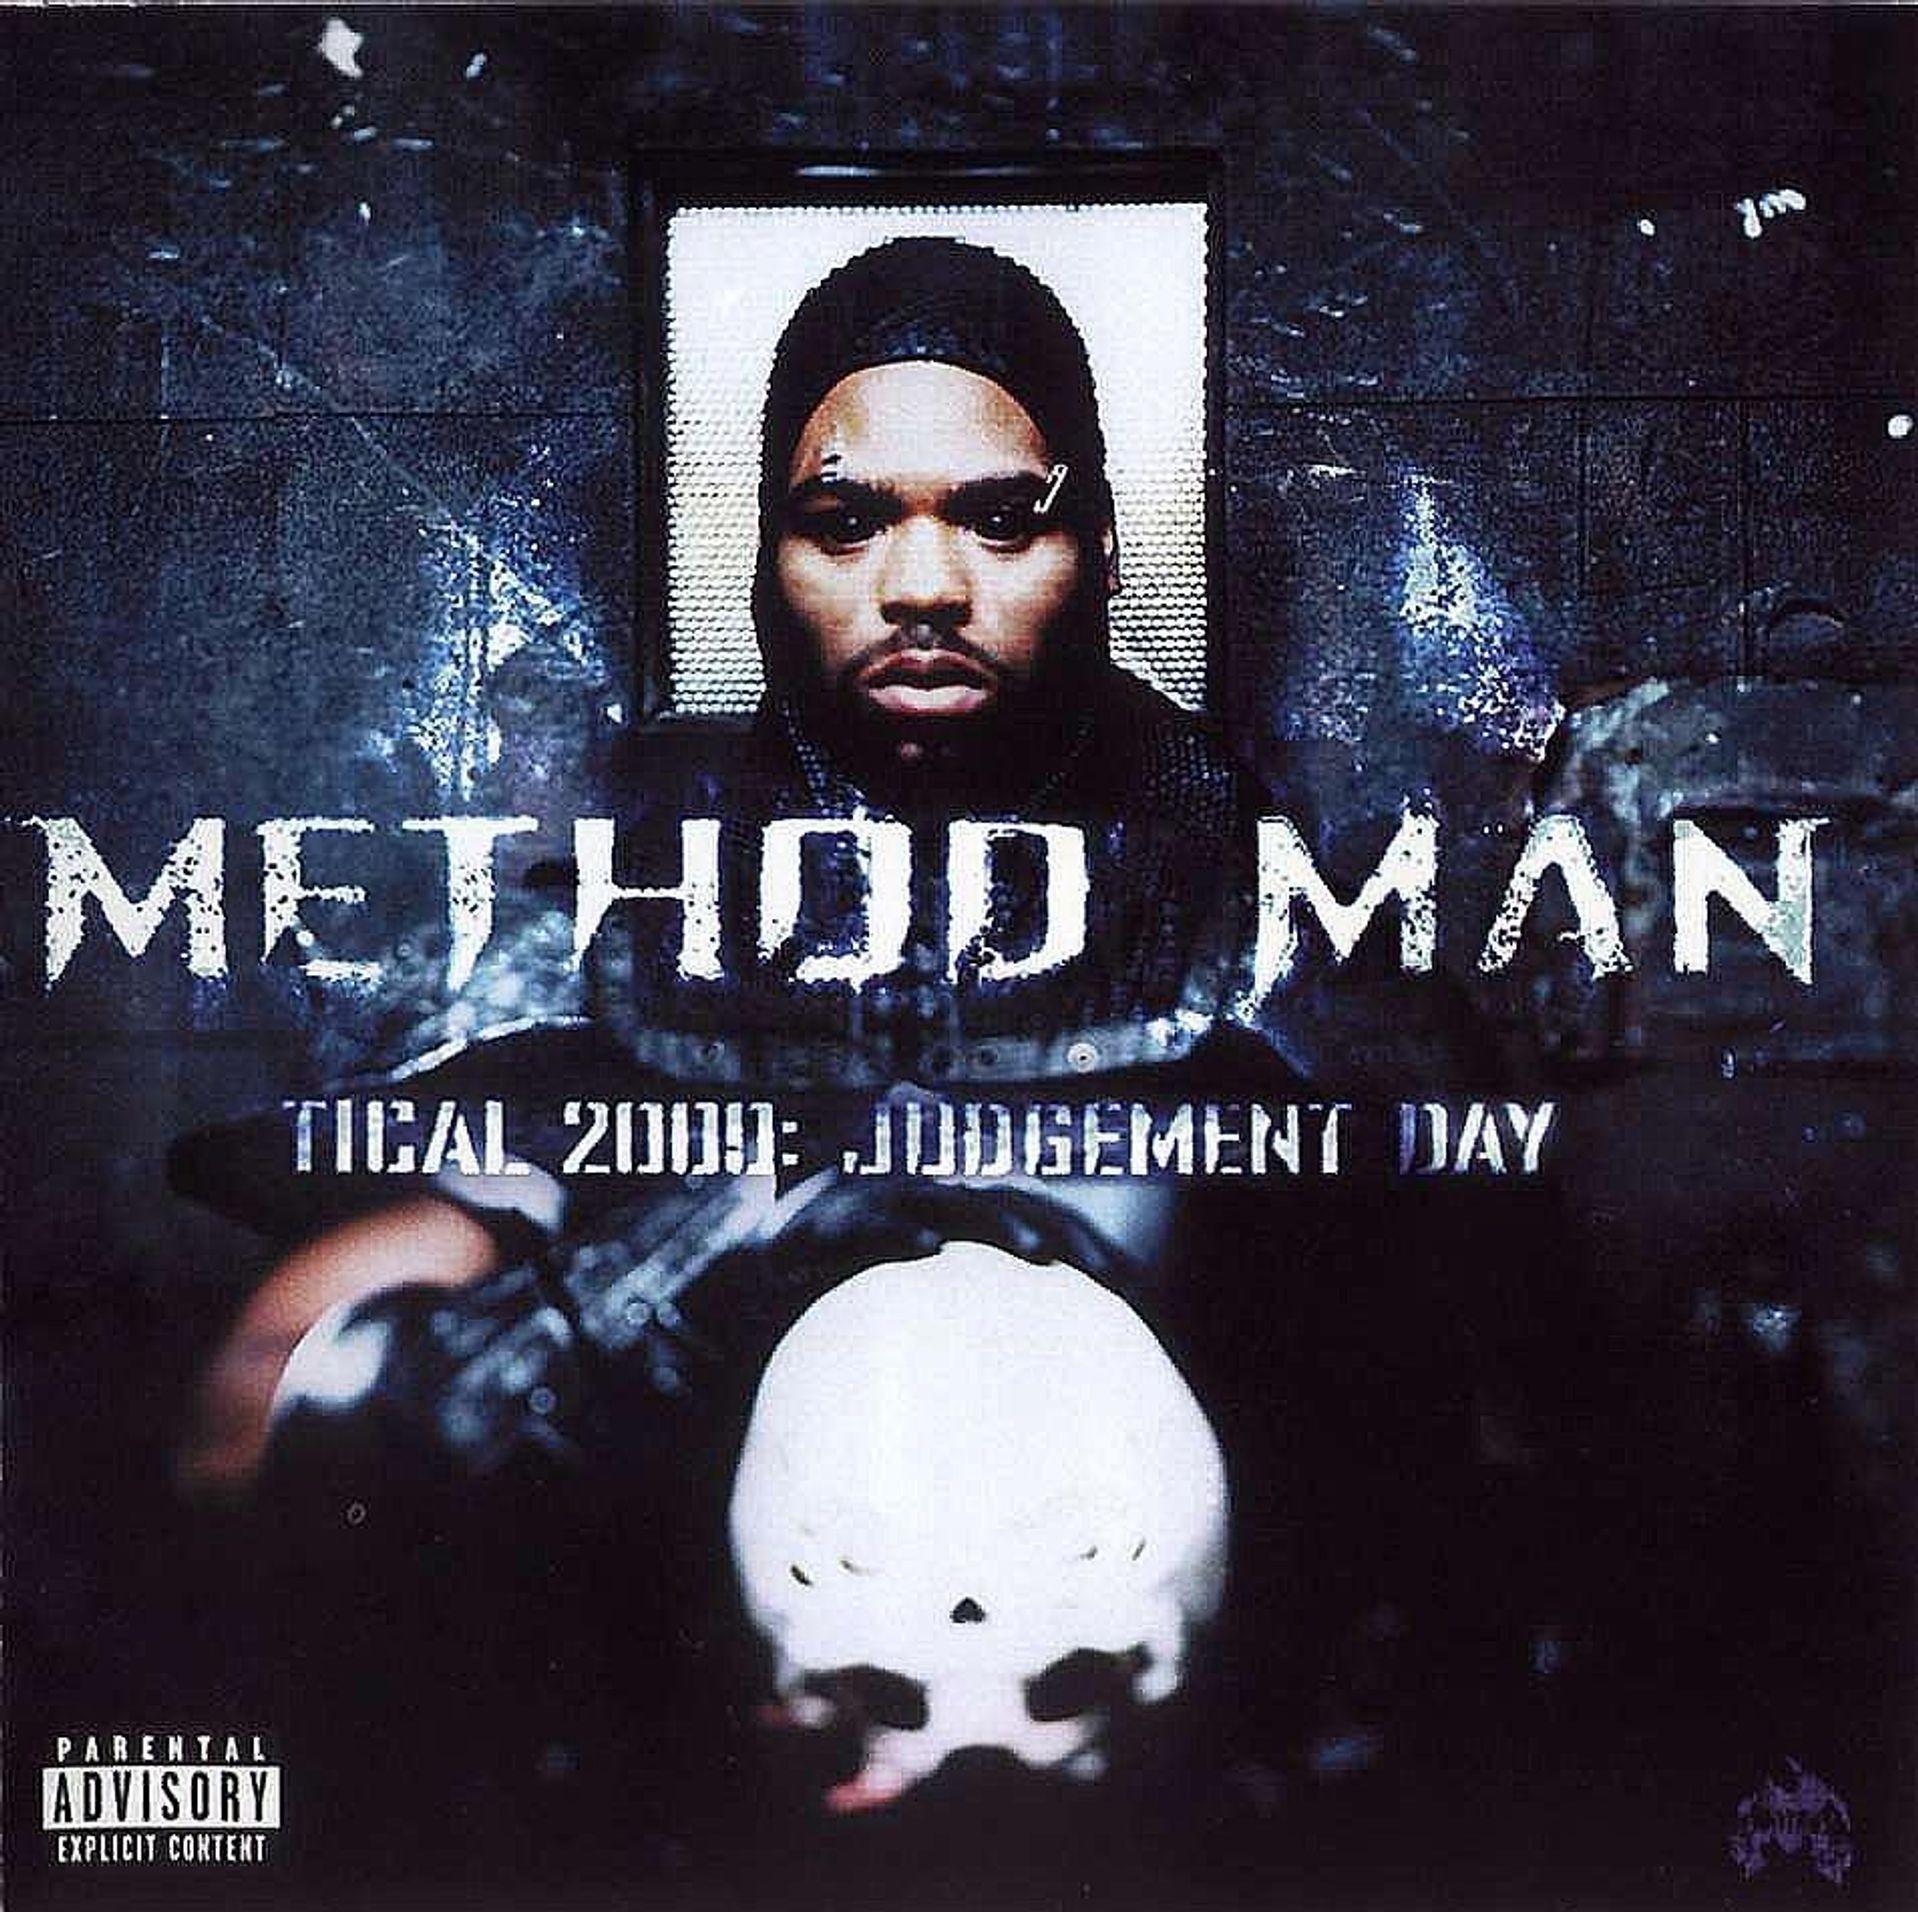 Album Title: Tical 2000: Judgement  by: Method Man